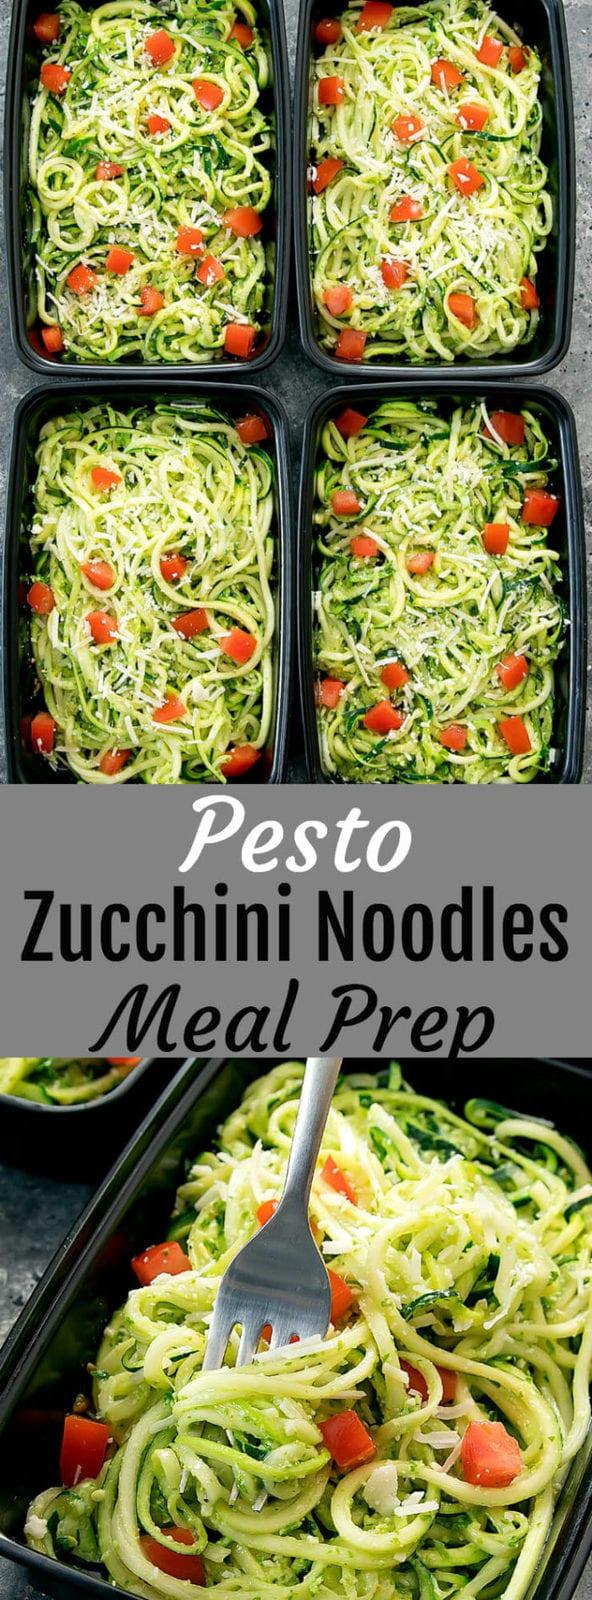 Pesto Zucchini Noodles Meal Prep